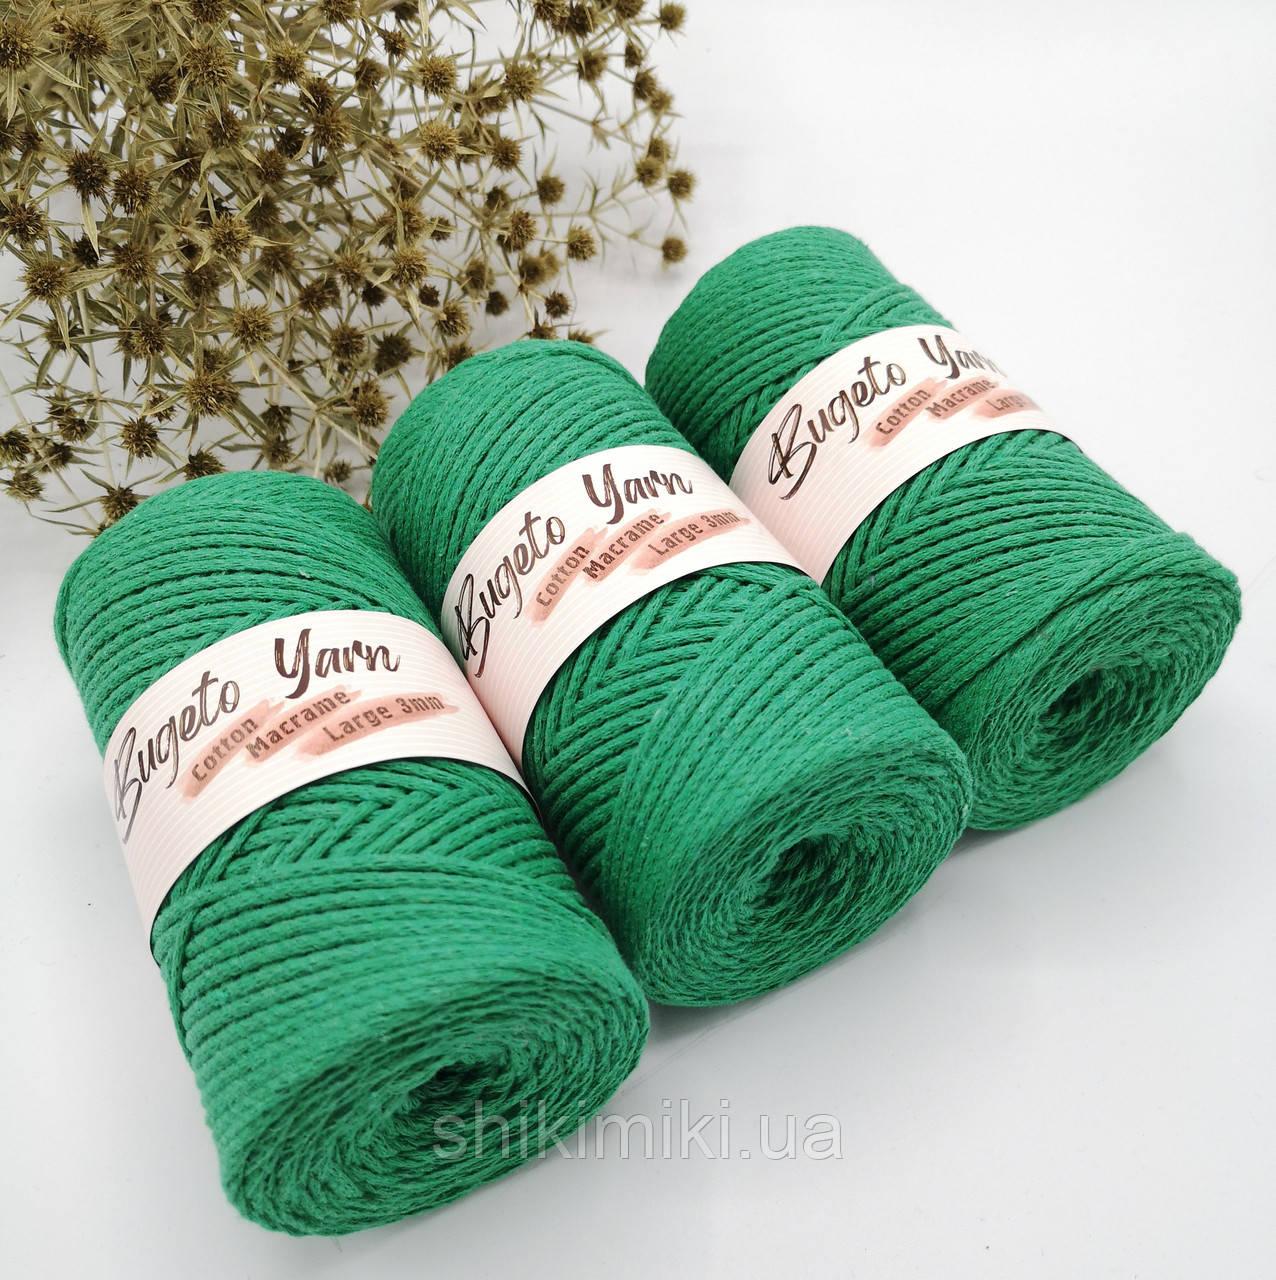 Эко шнур Cotton Macrame Large 3 mm,цвет Трава